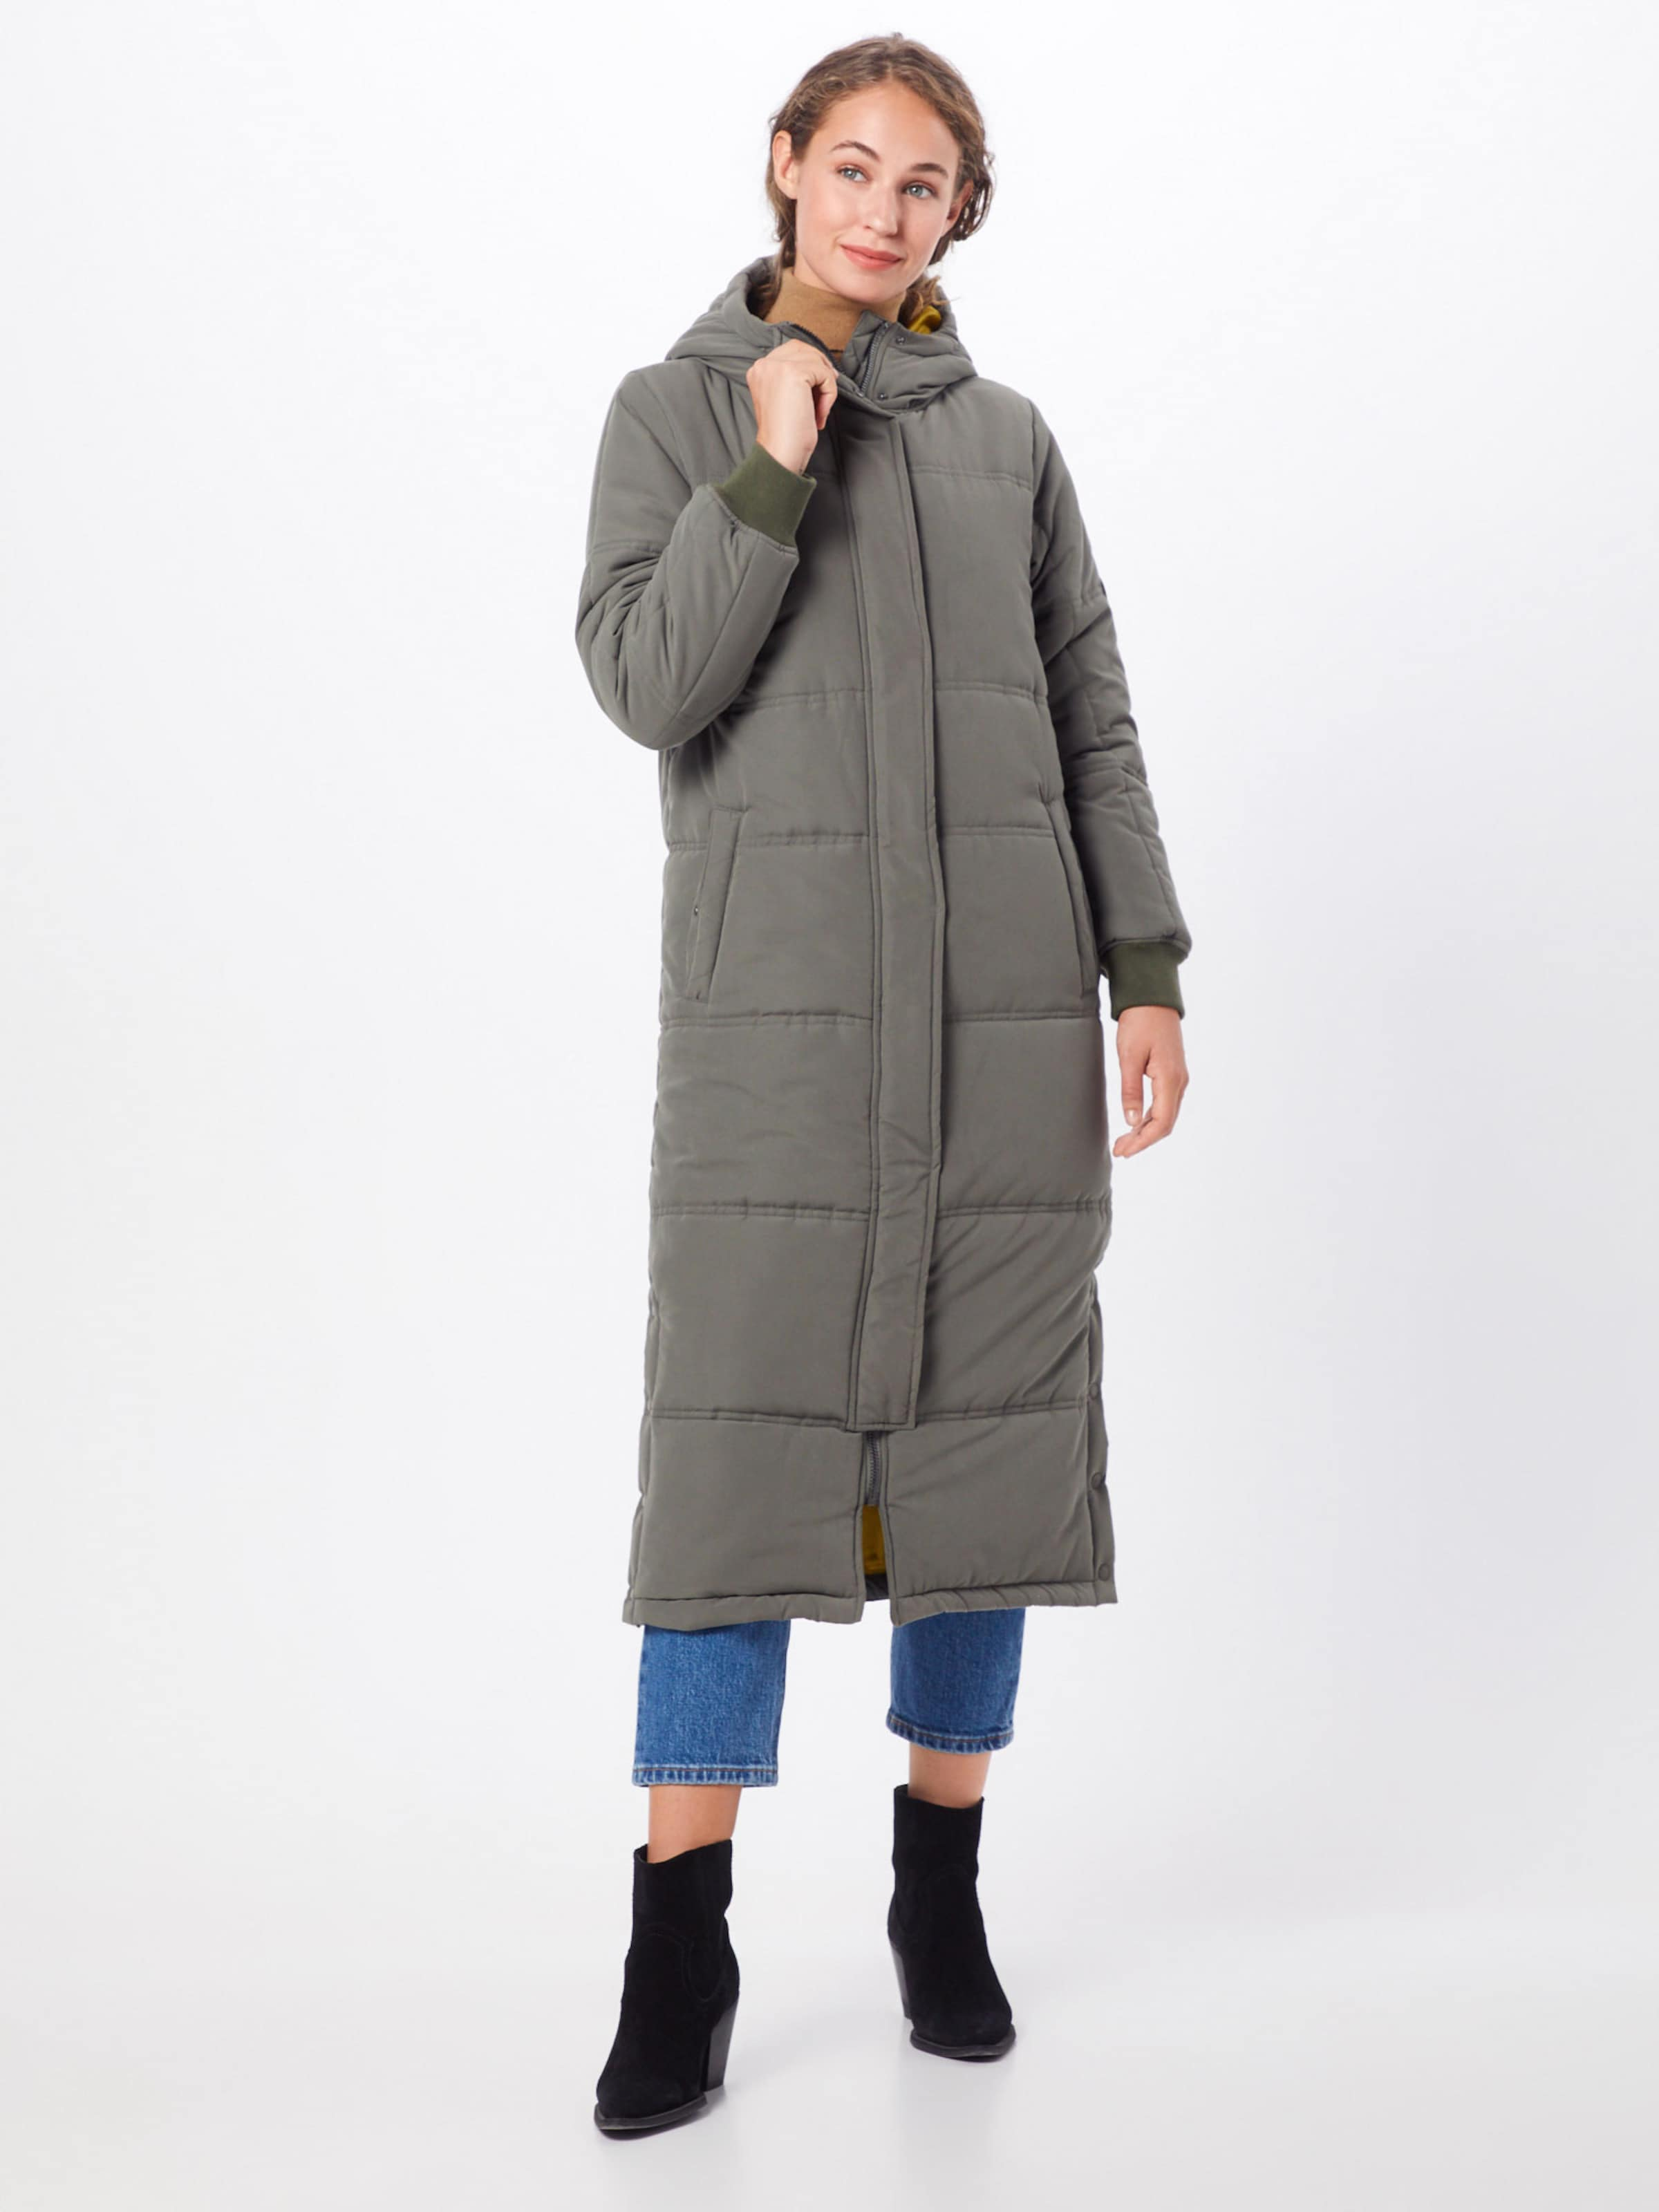 Coat' Mantel 'wostok In Iriedaily Oliv JTc3FK1l